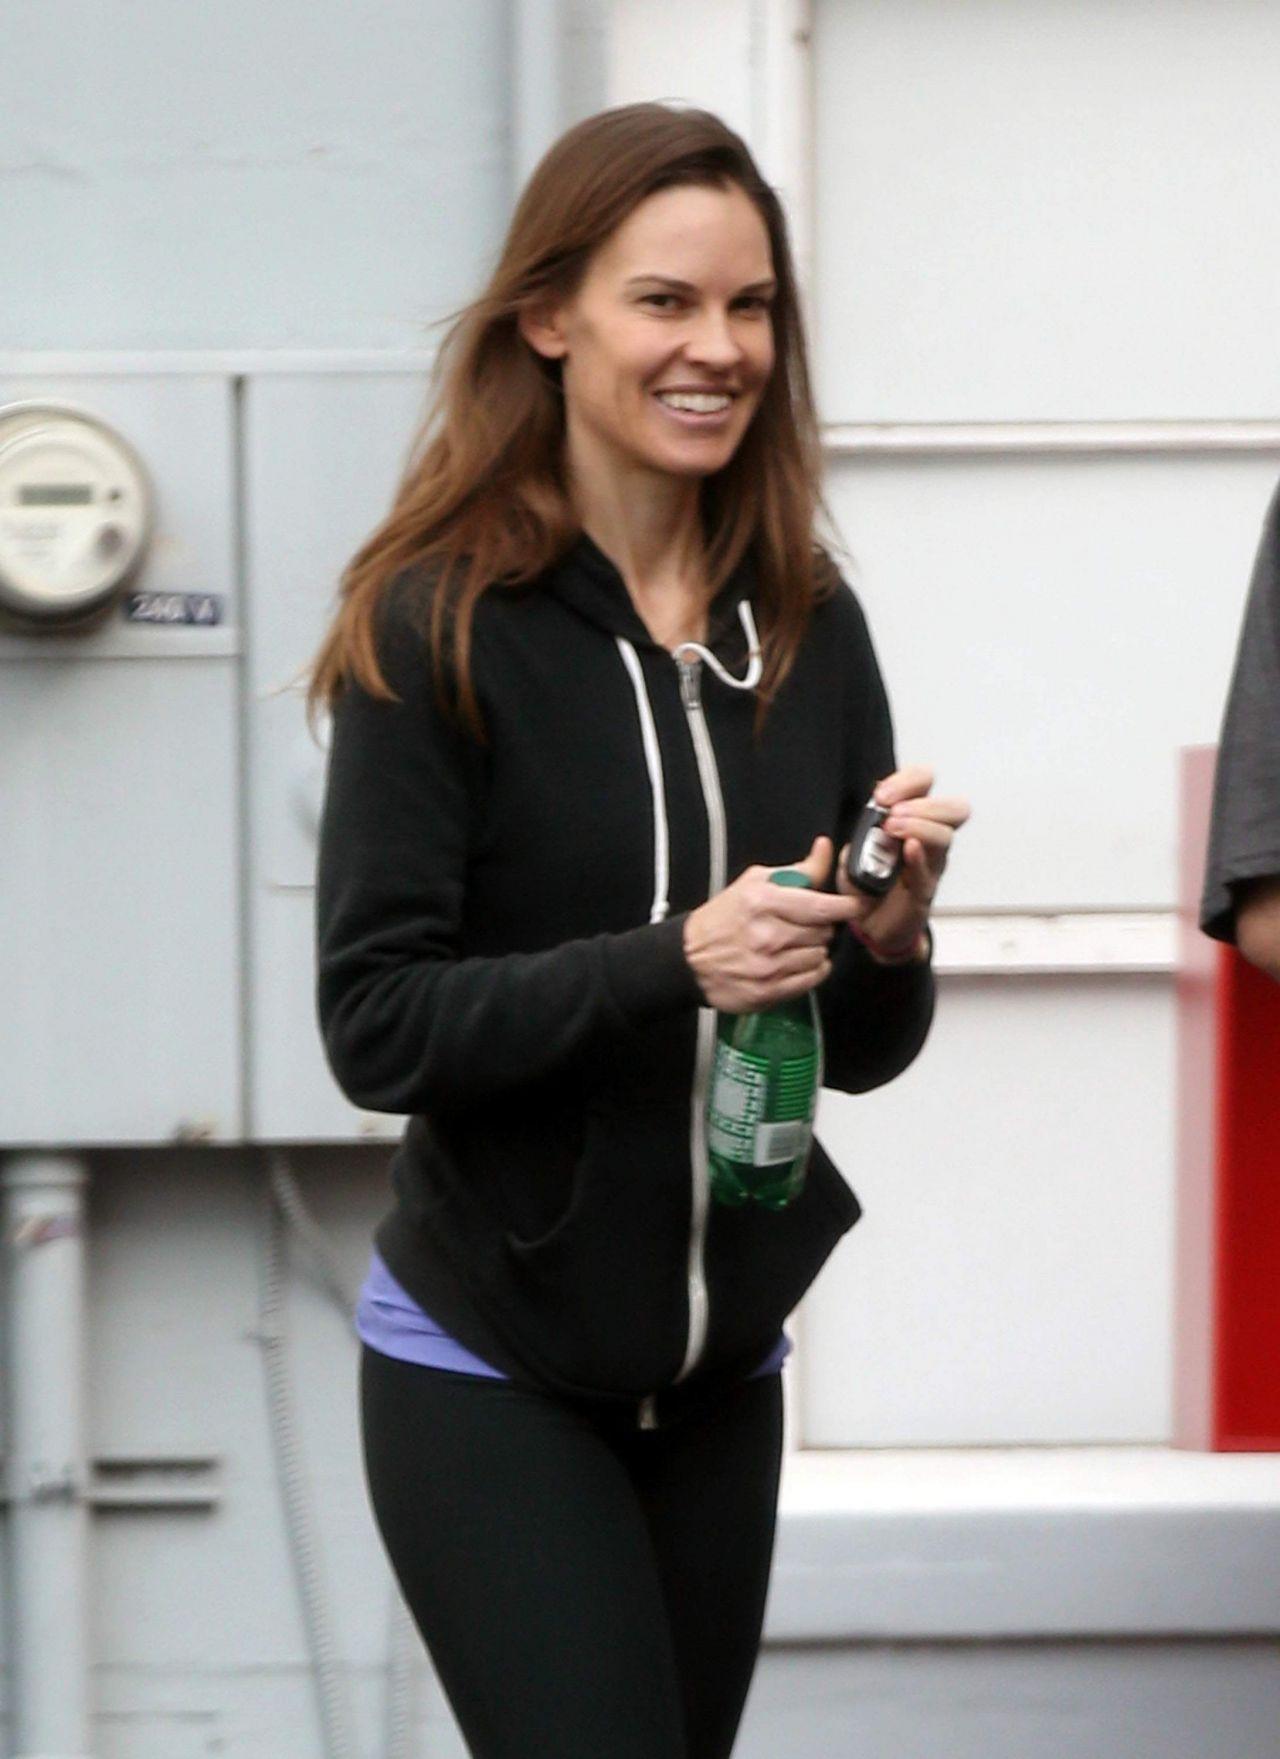 Hilary Swank Booty In Leggings Leaving A Gym In Los